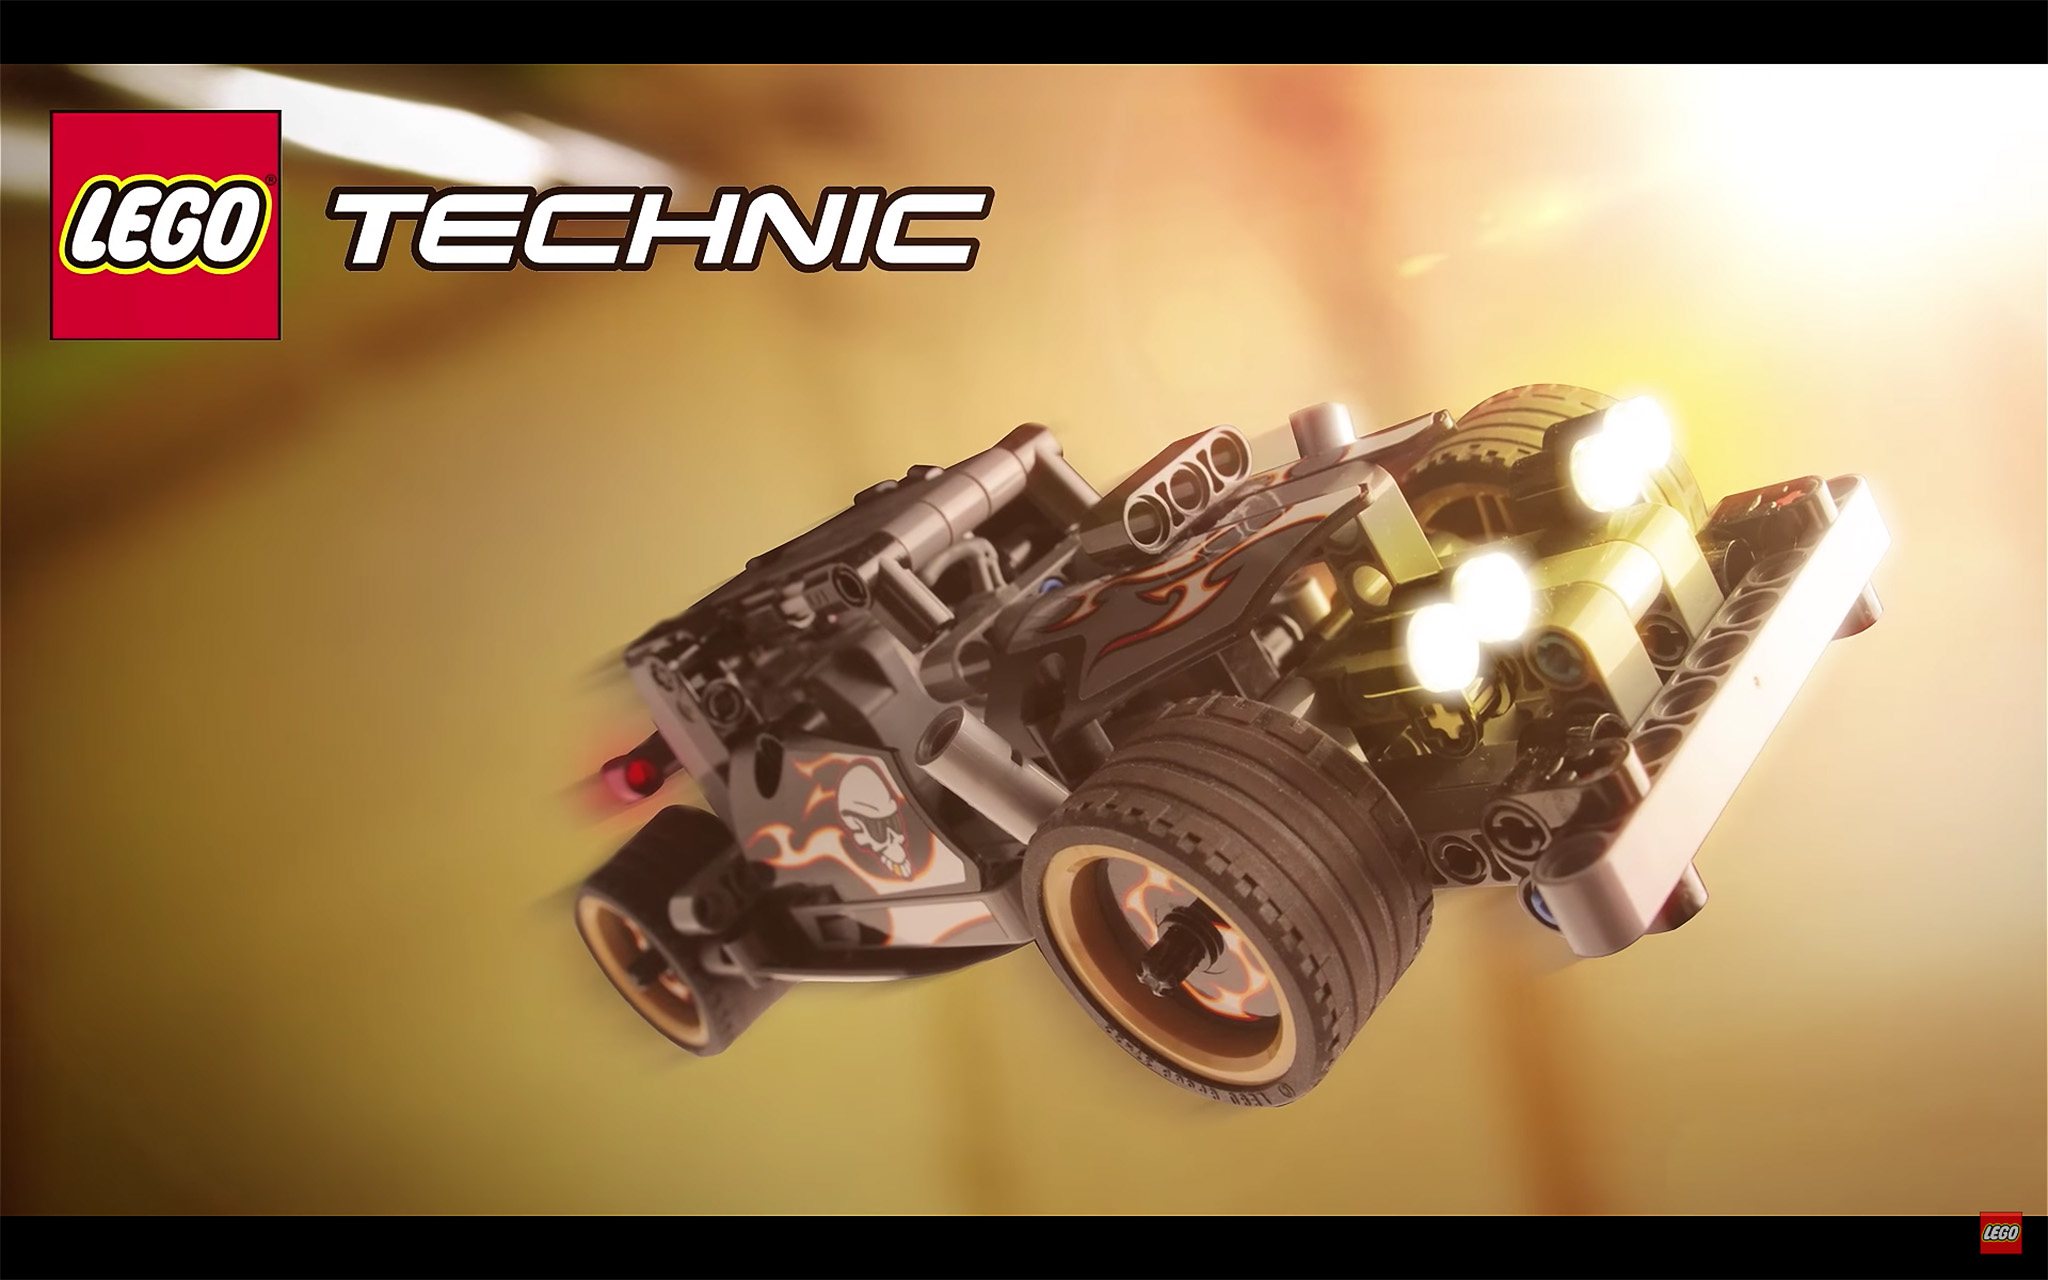 Lego Technic Getaway Racer Featured In New Video